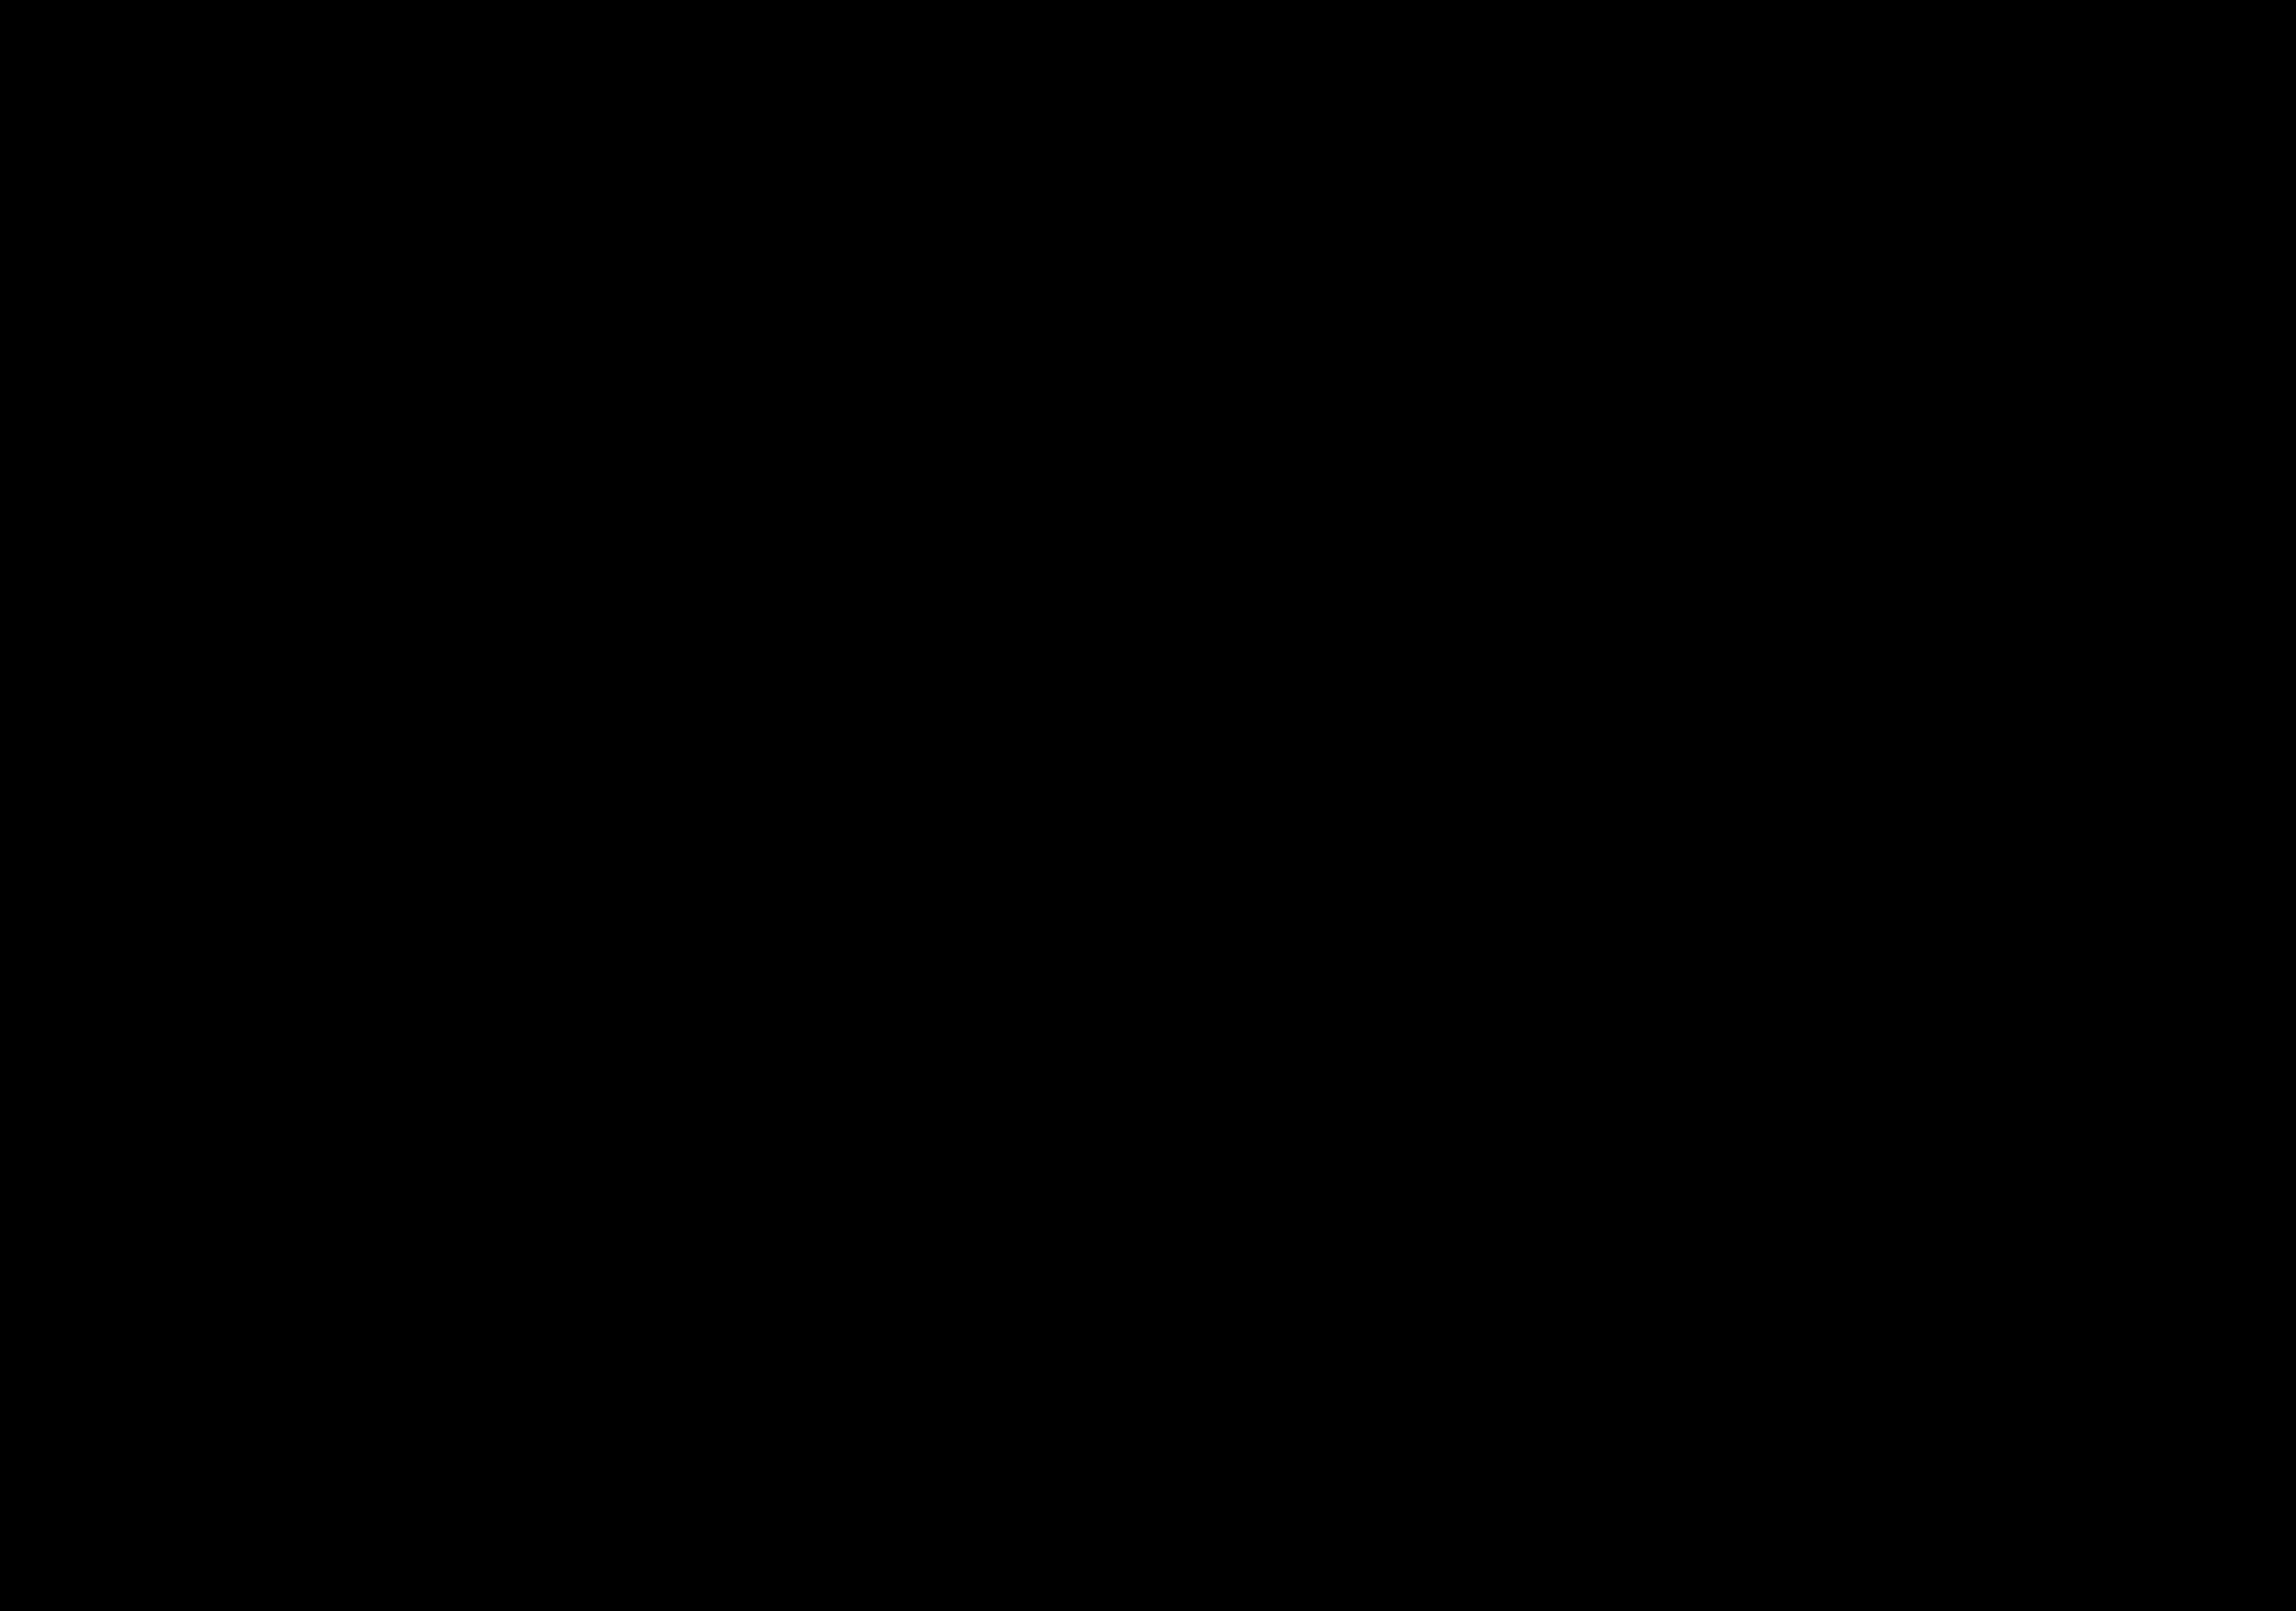 2320x1628 Clipart